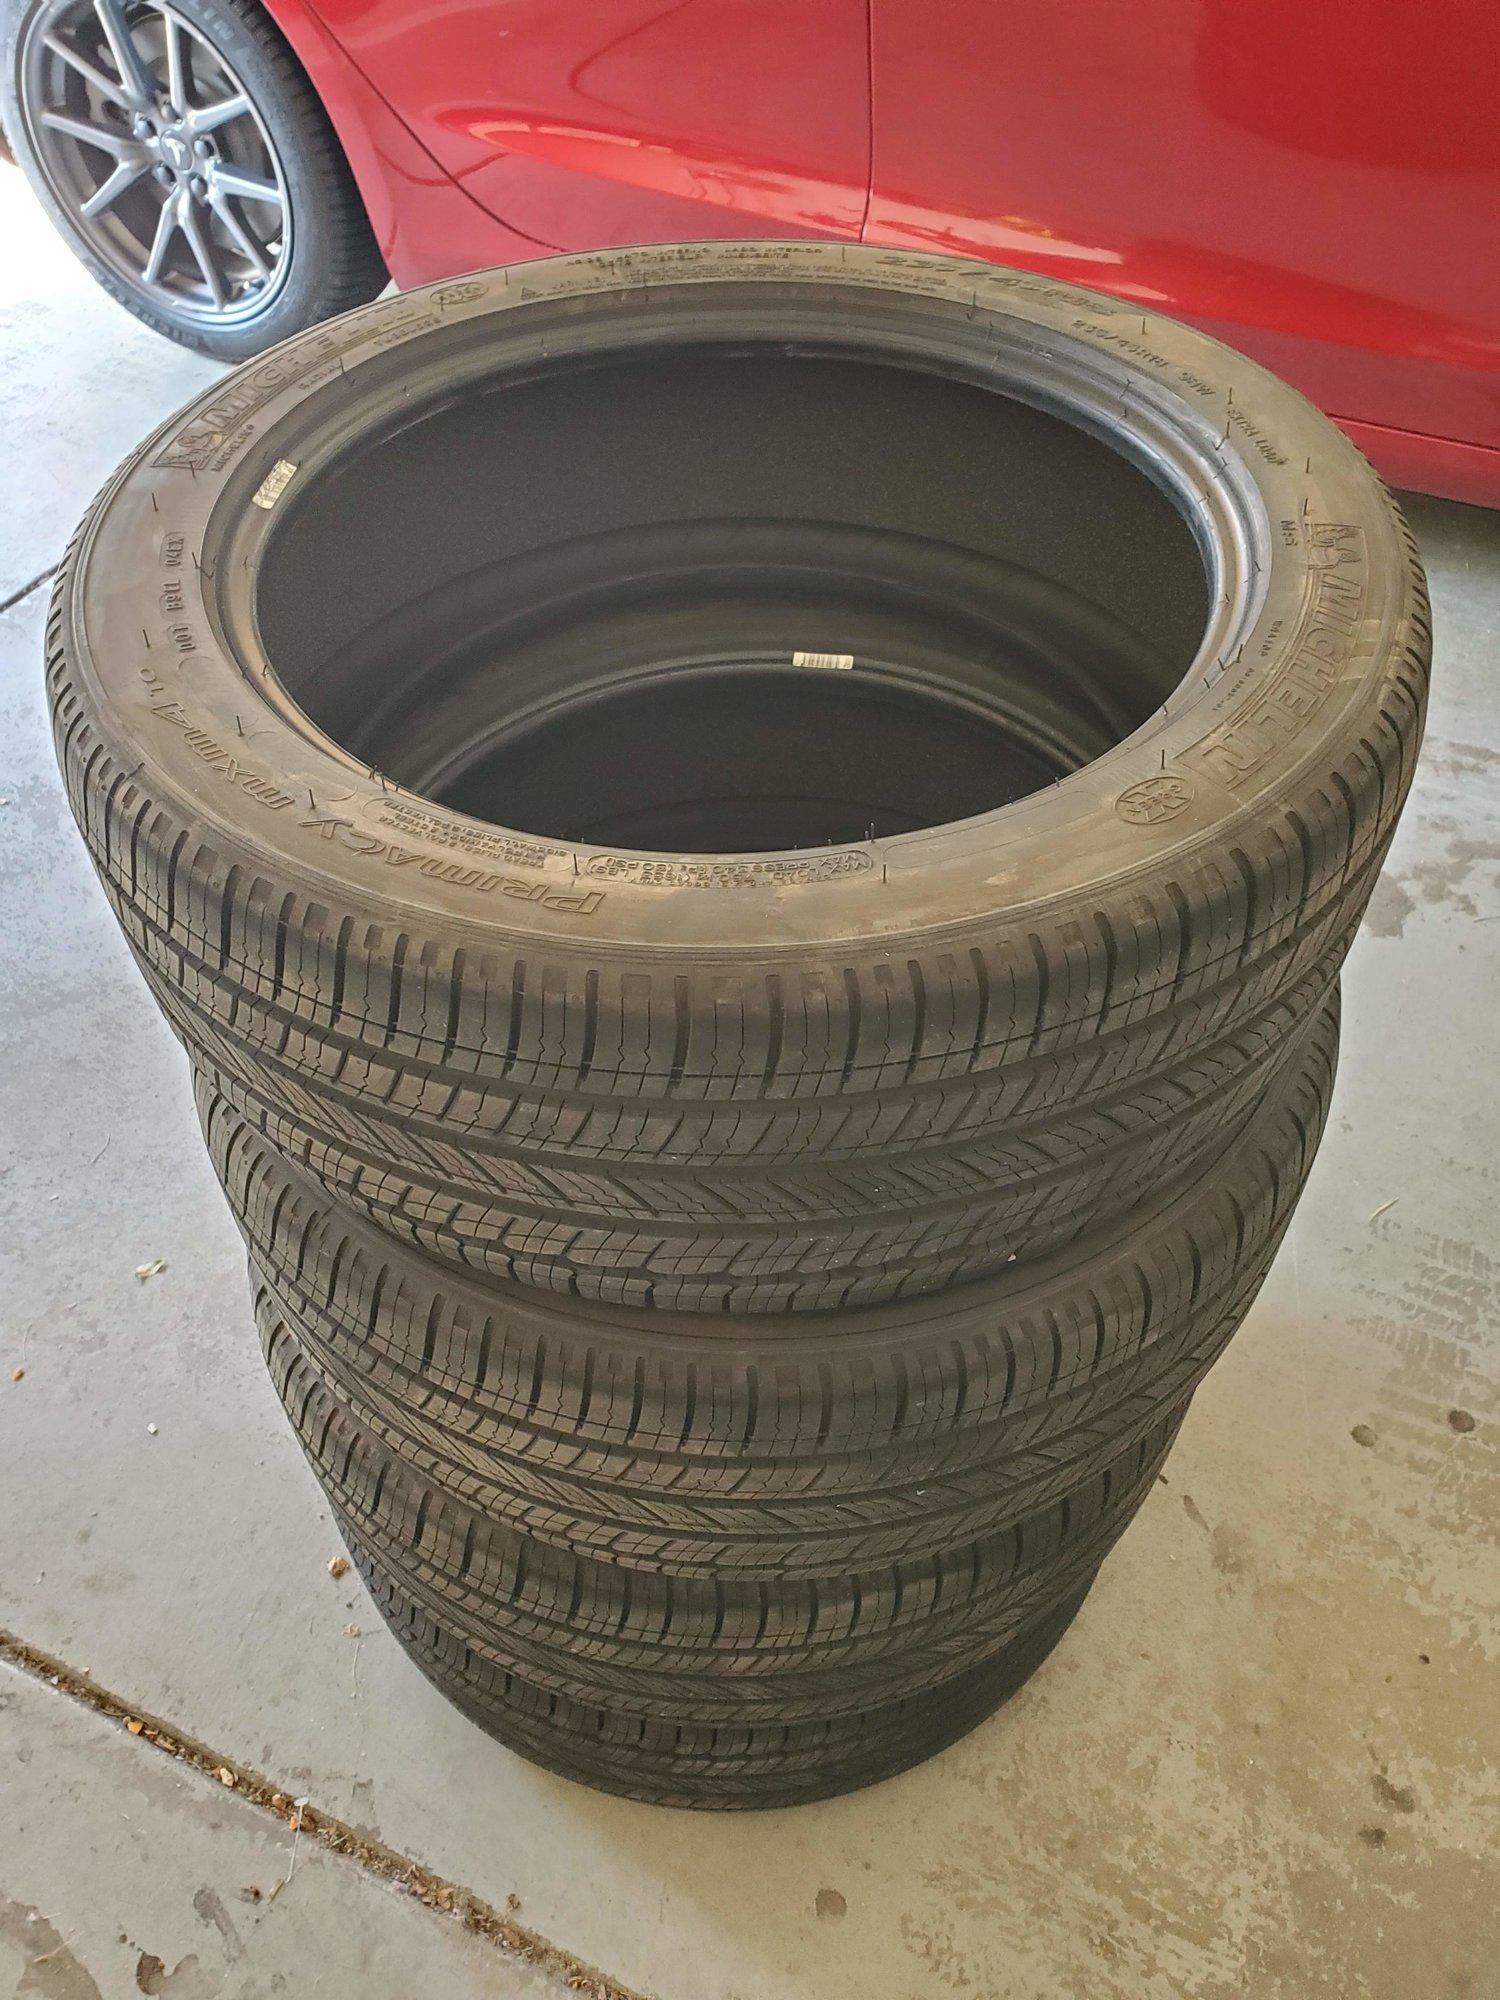 Tesla Model 3 tires.jpg